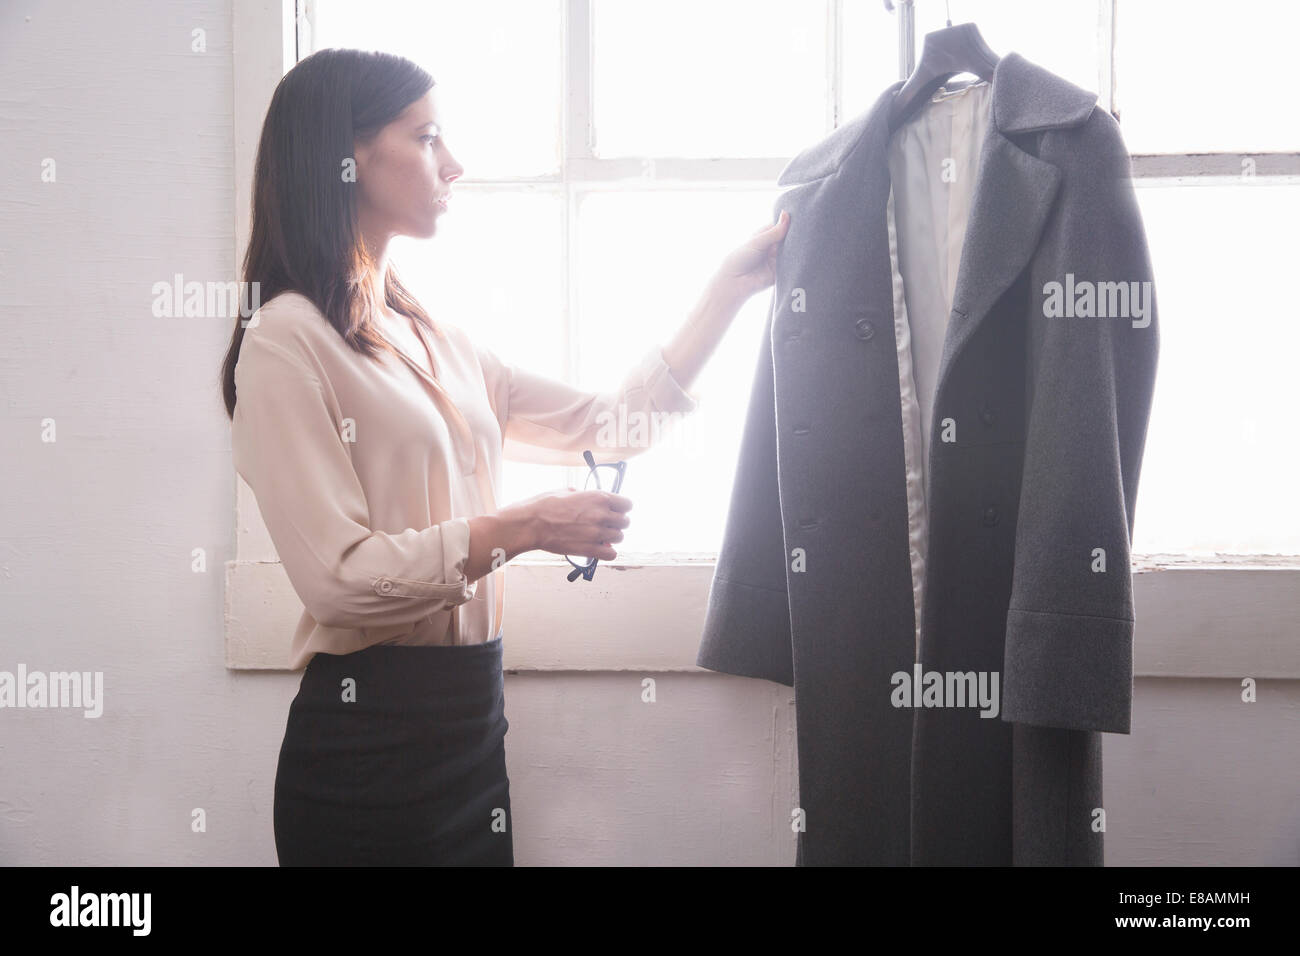 Businesswoman inspecting grey coat - Stock Image